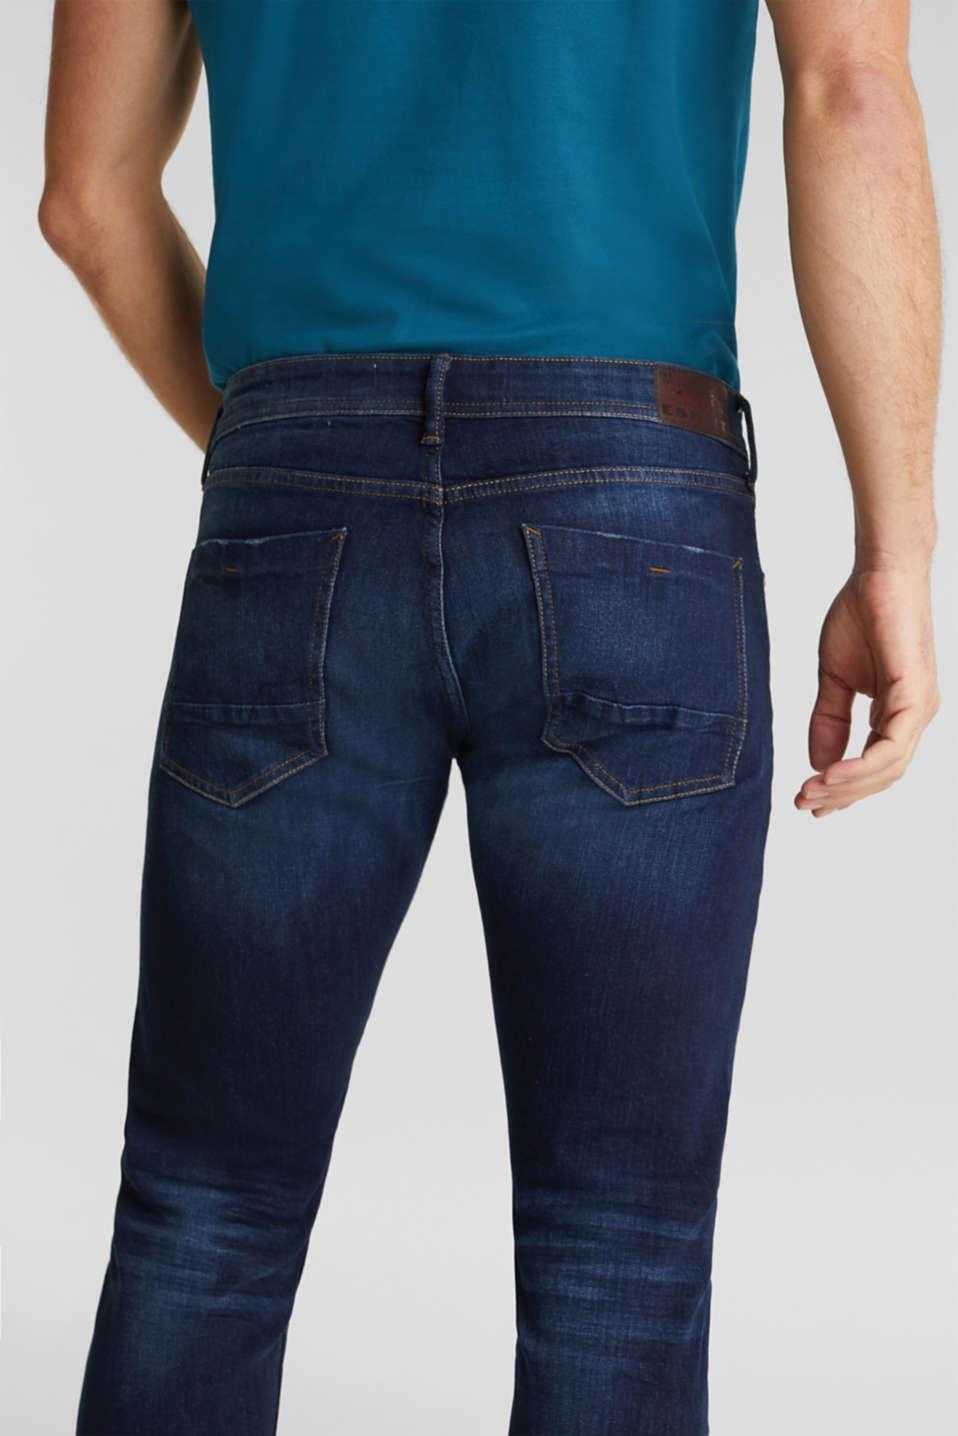 Vintage wash two-way stretch jeans, BLUE DARK WASH, detail image number 6